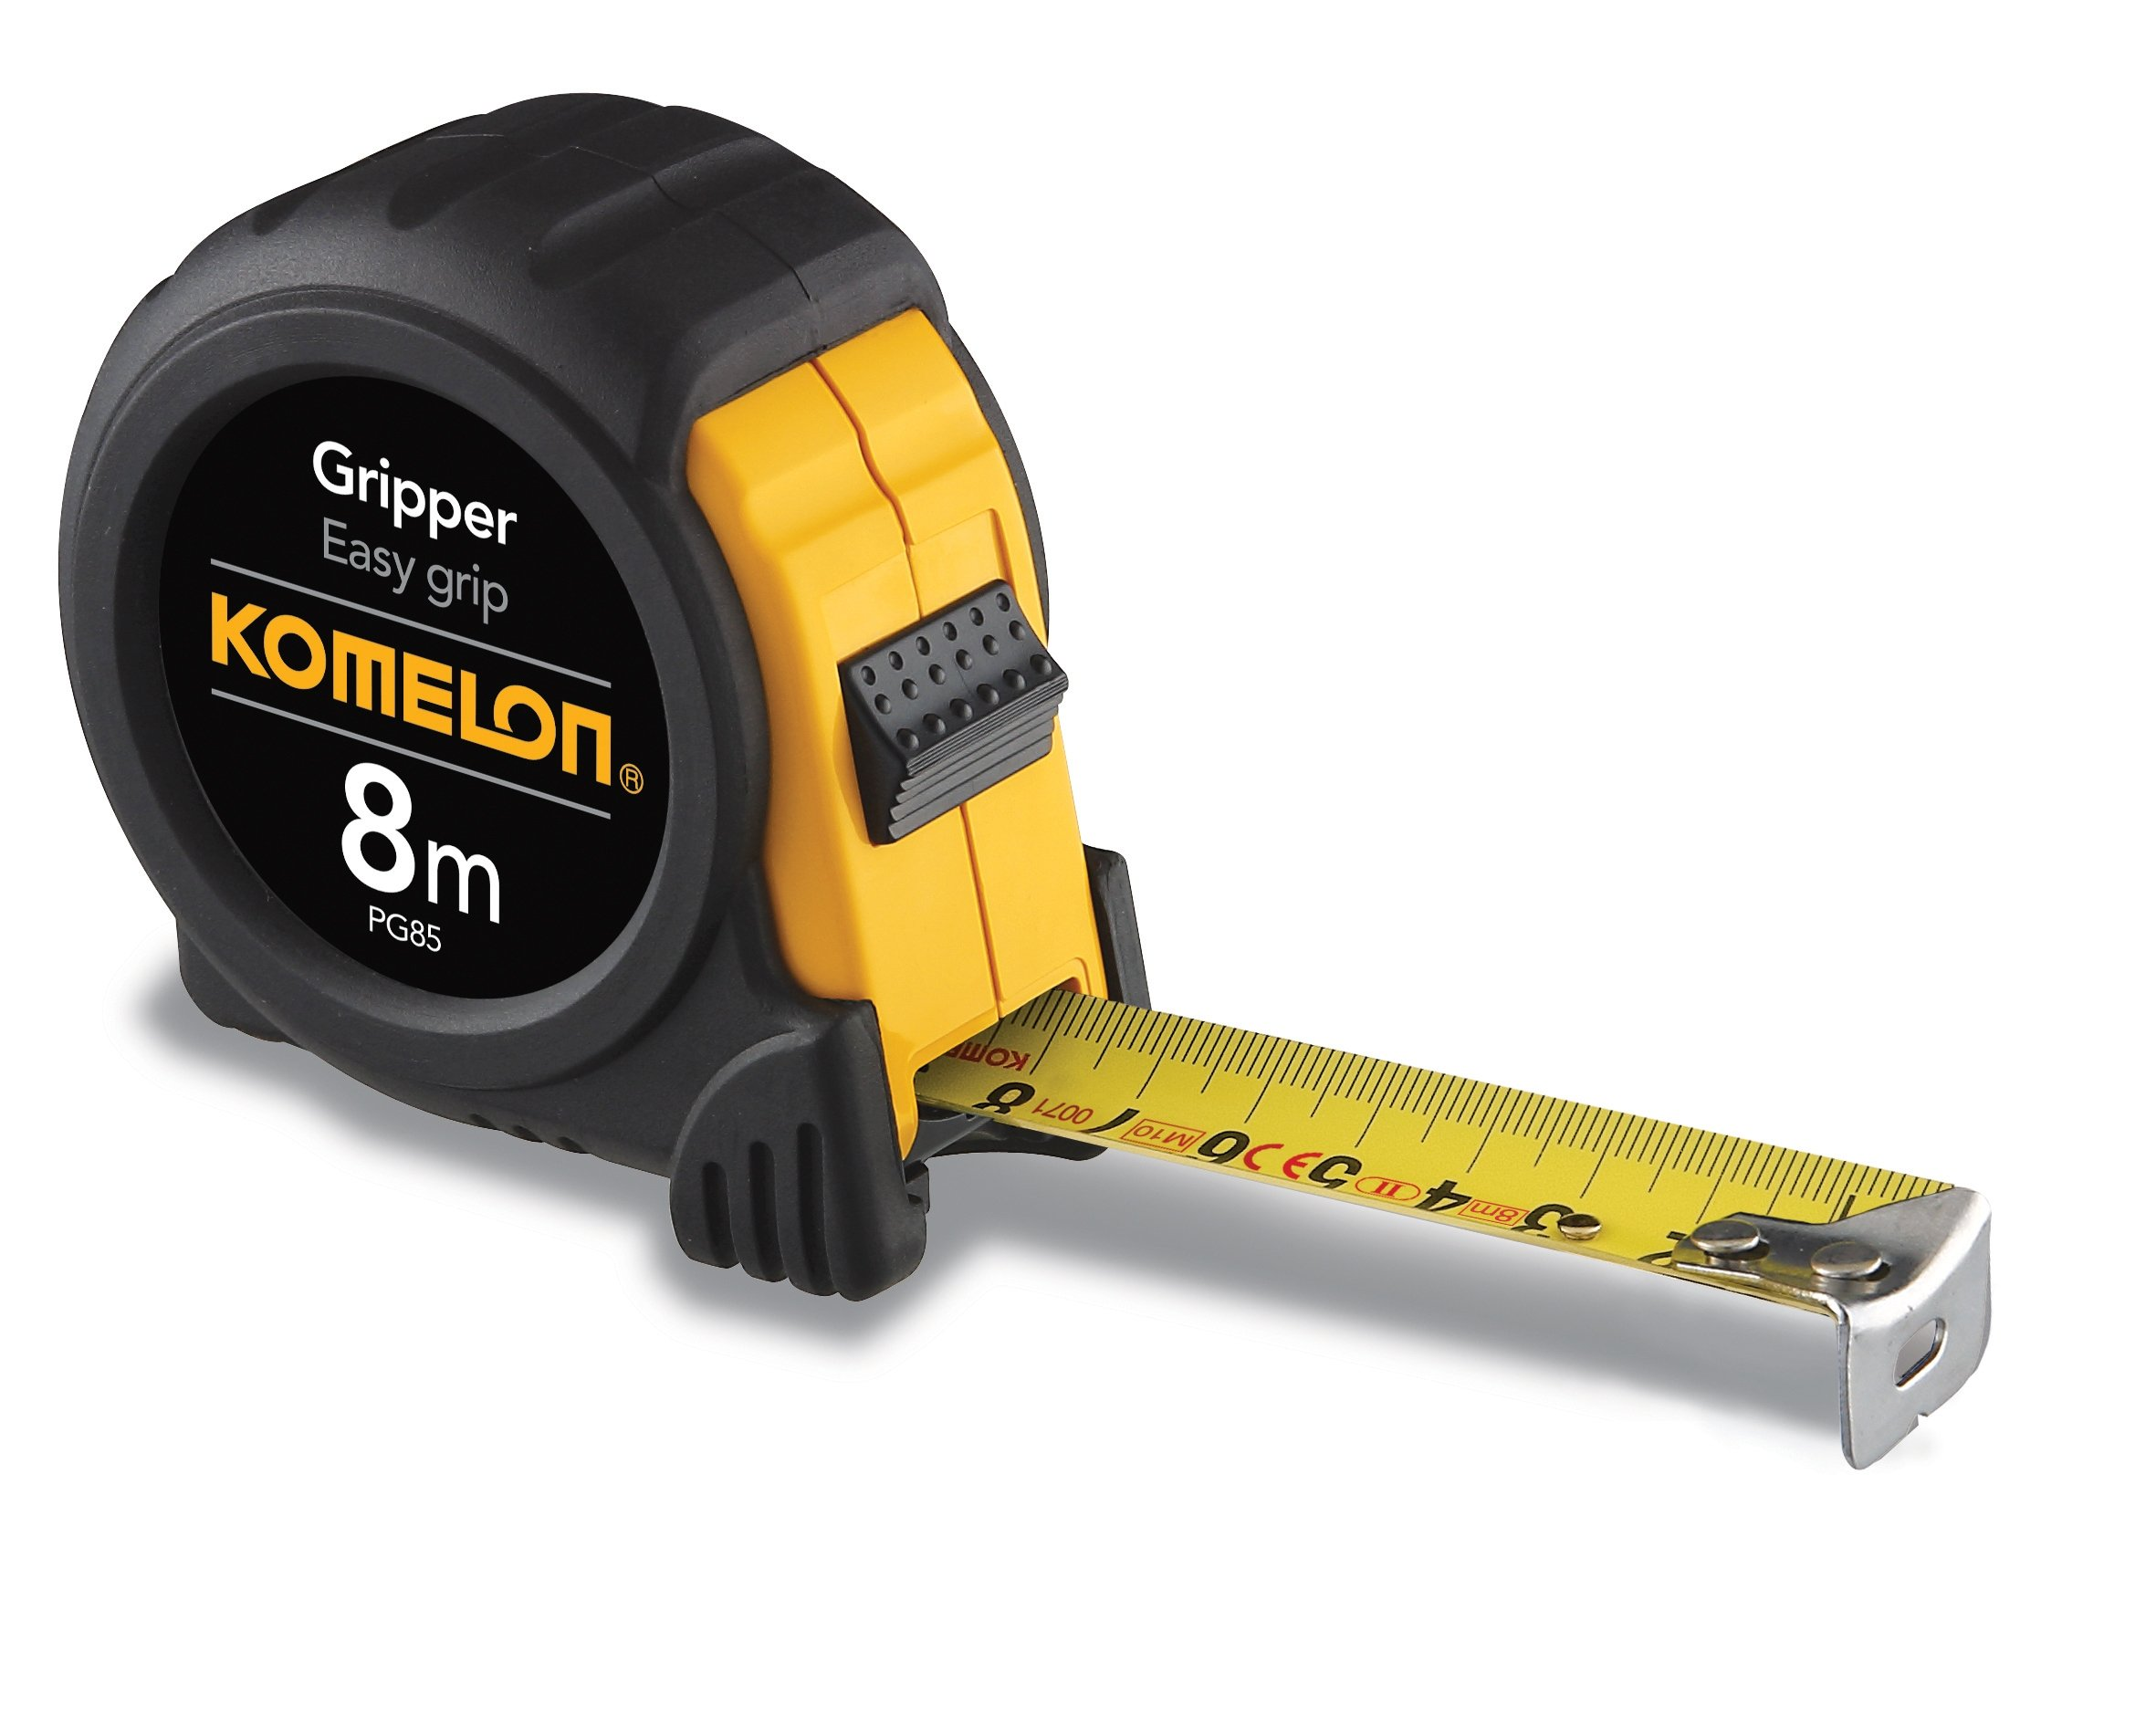 Komelon PG85 8m by 25mm Metric Gripper Tape, Black